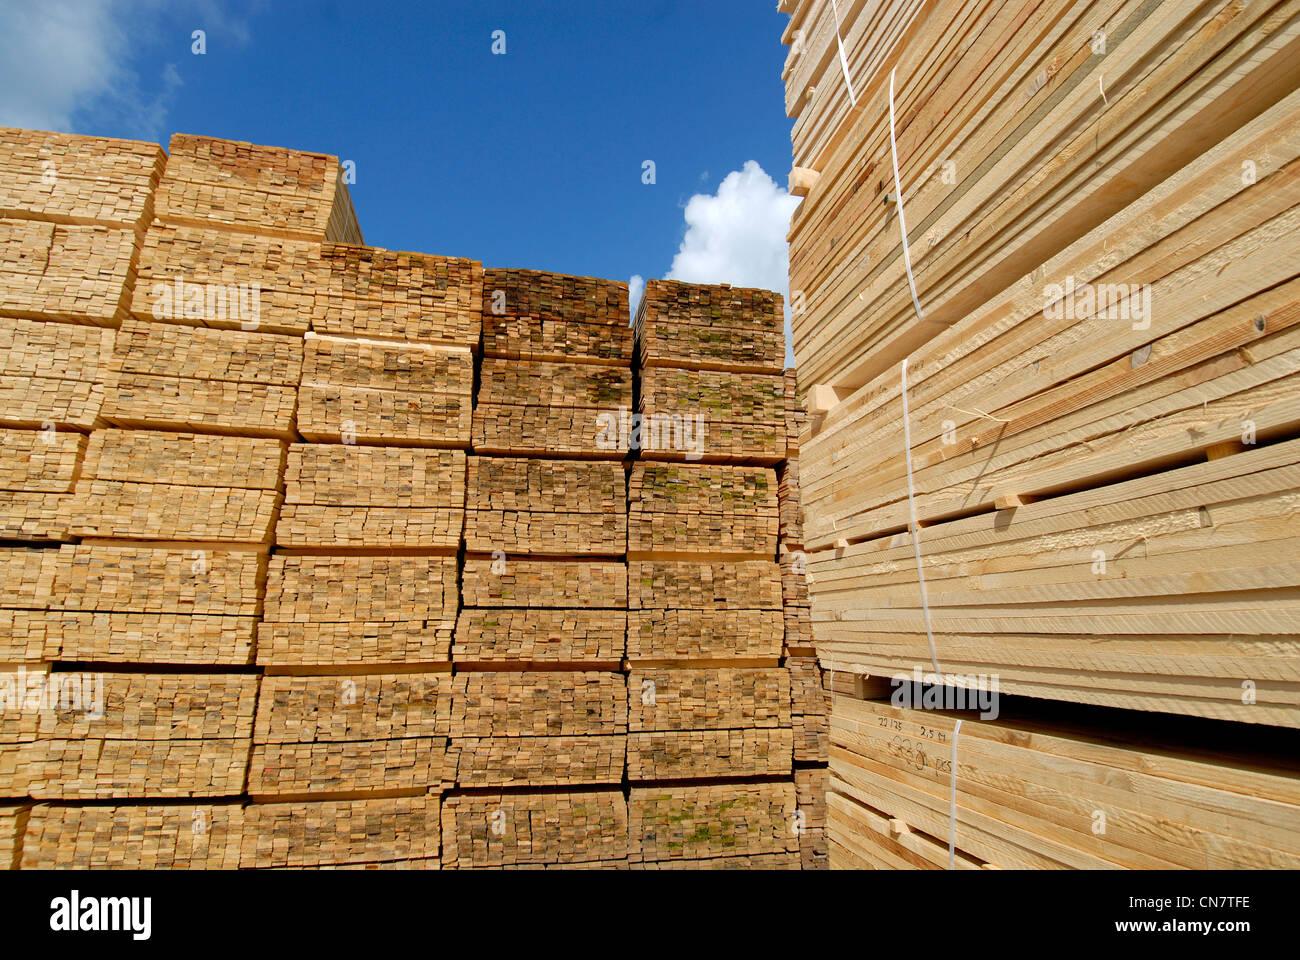 France, Vosges, Xonrupt, J. Mathieu sawmill, spruce boards - Stock Image